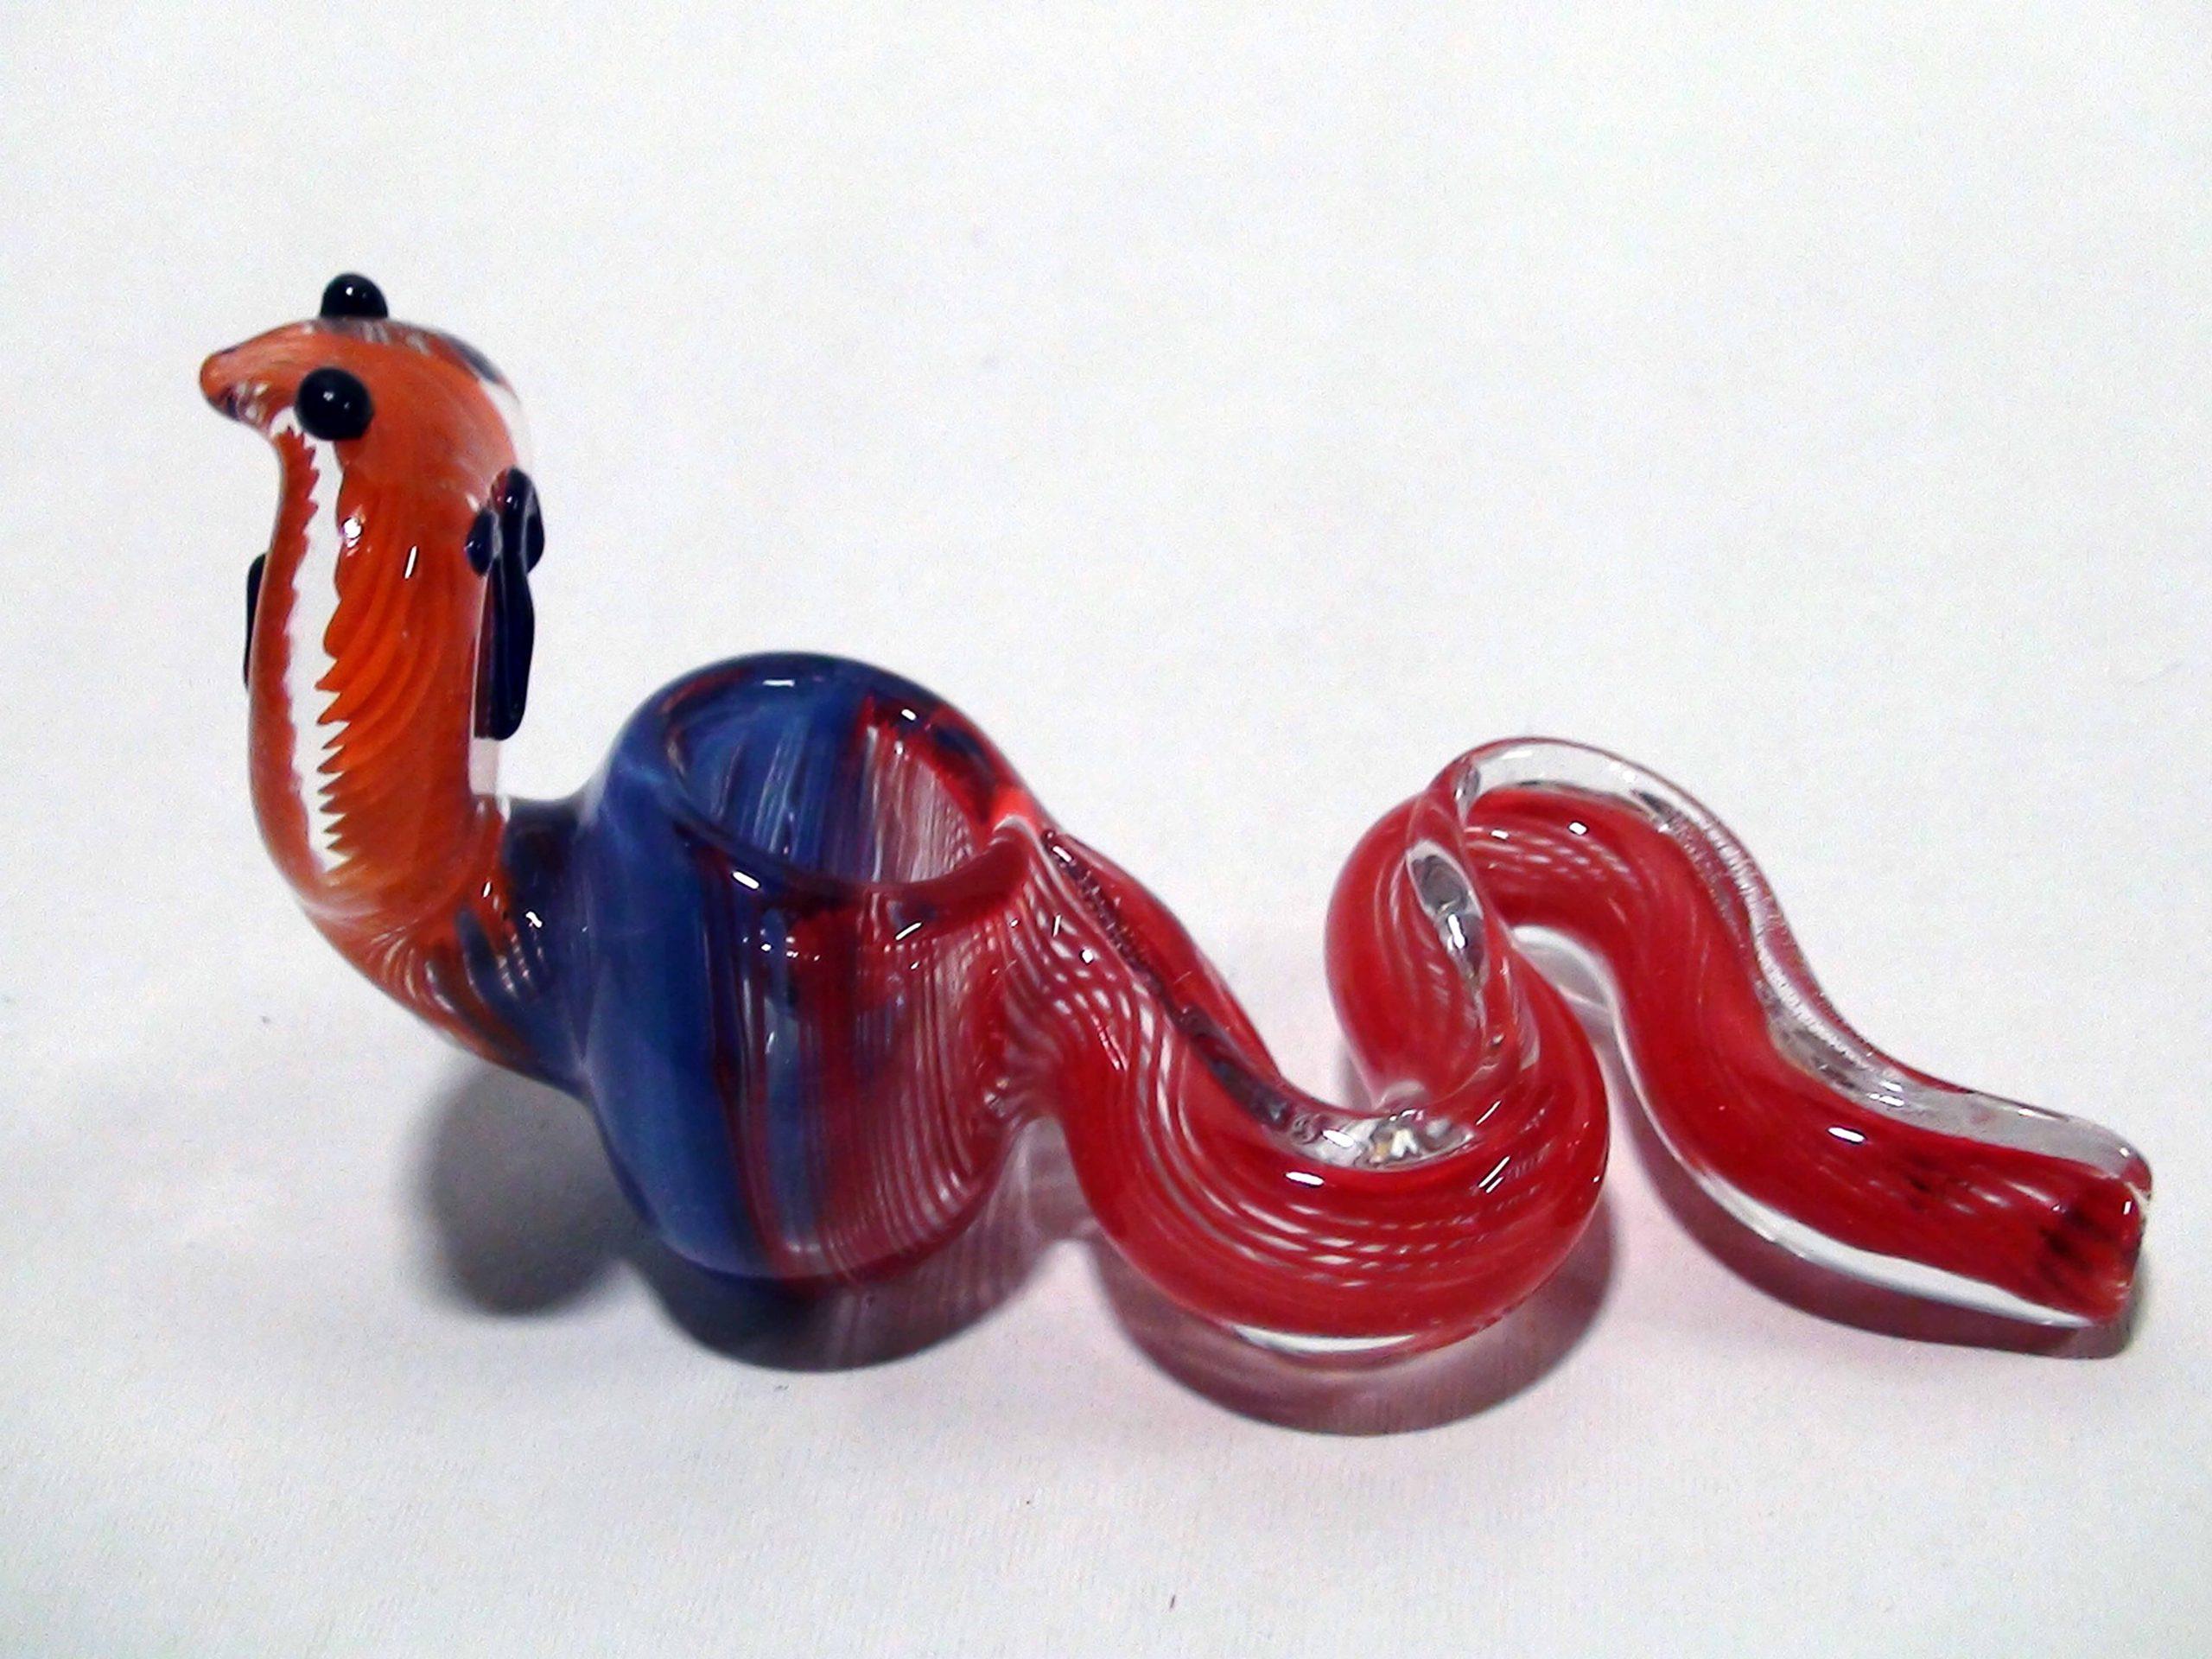 Snail Shaped Bubbler